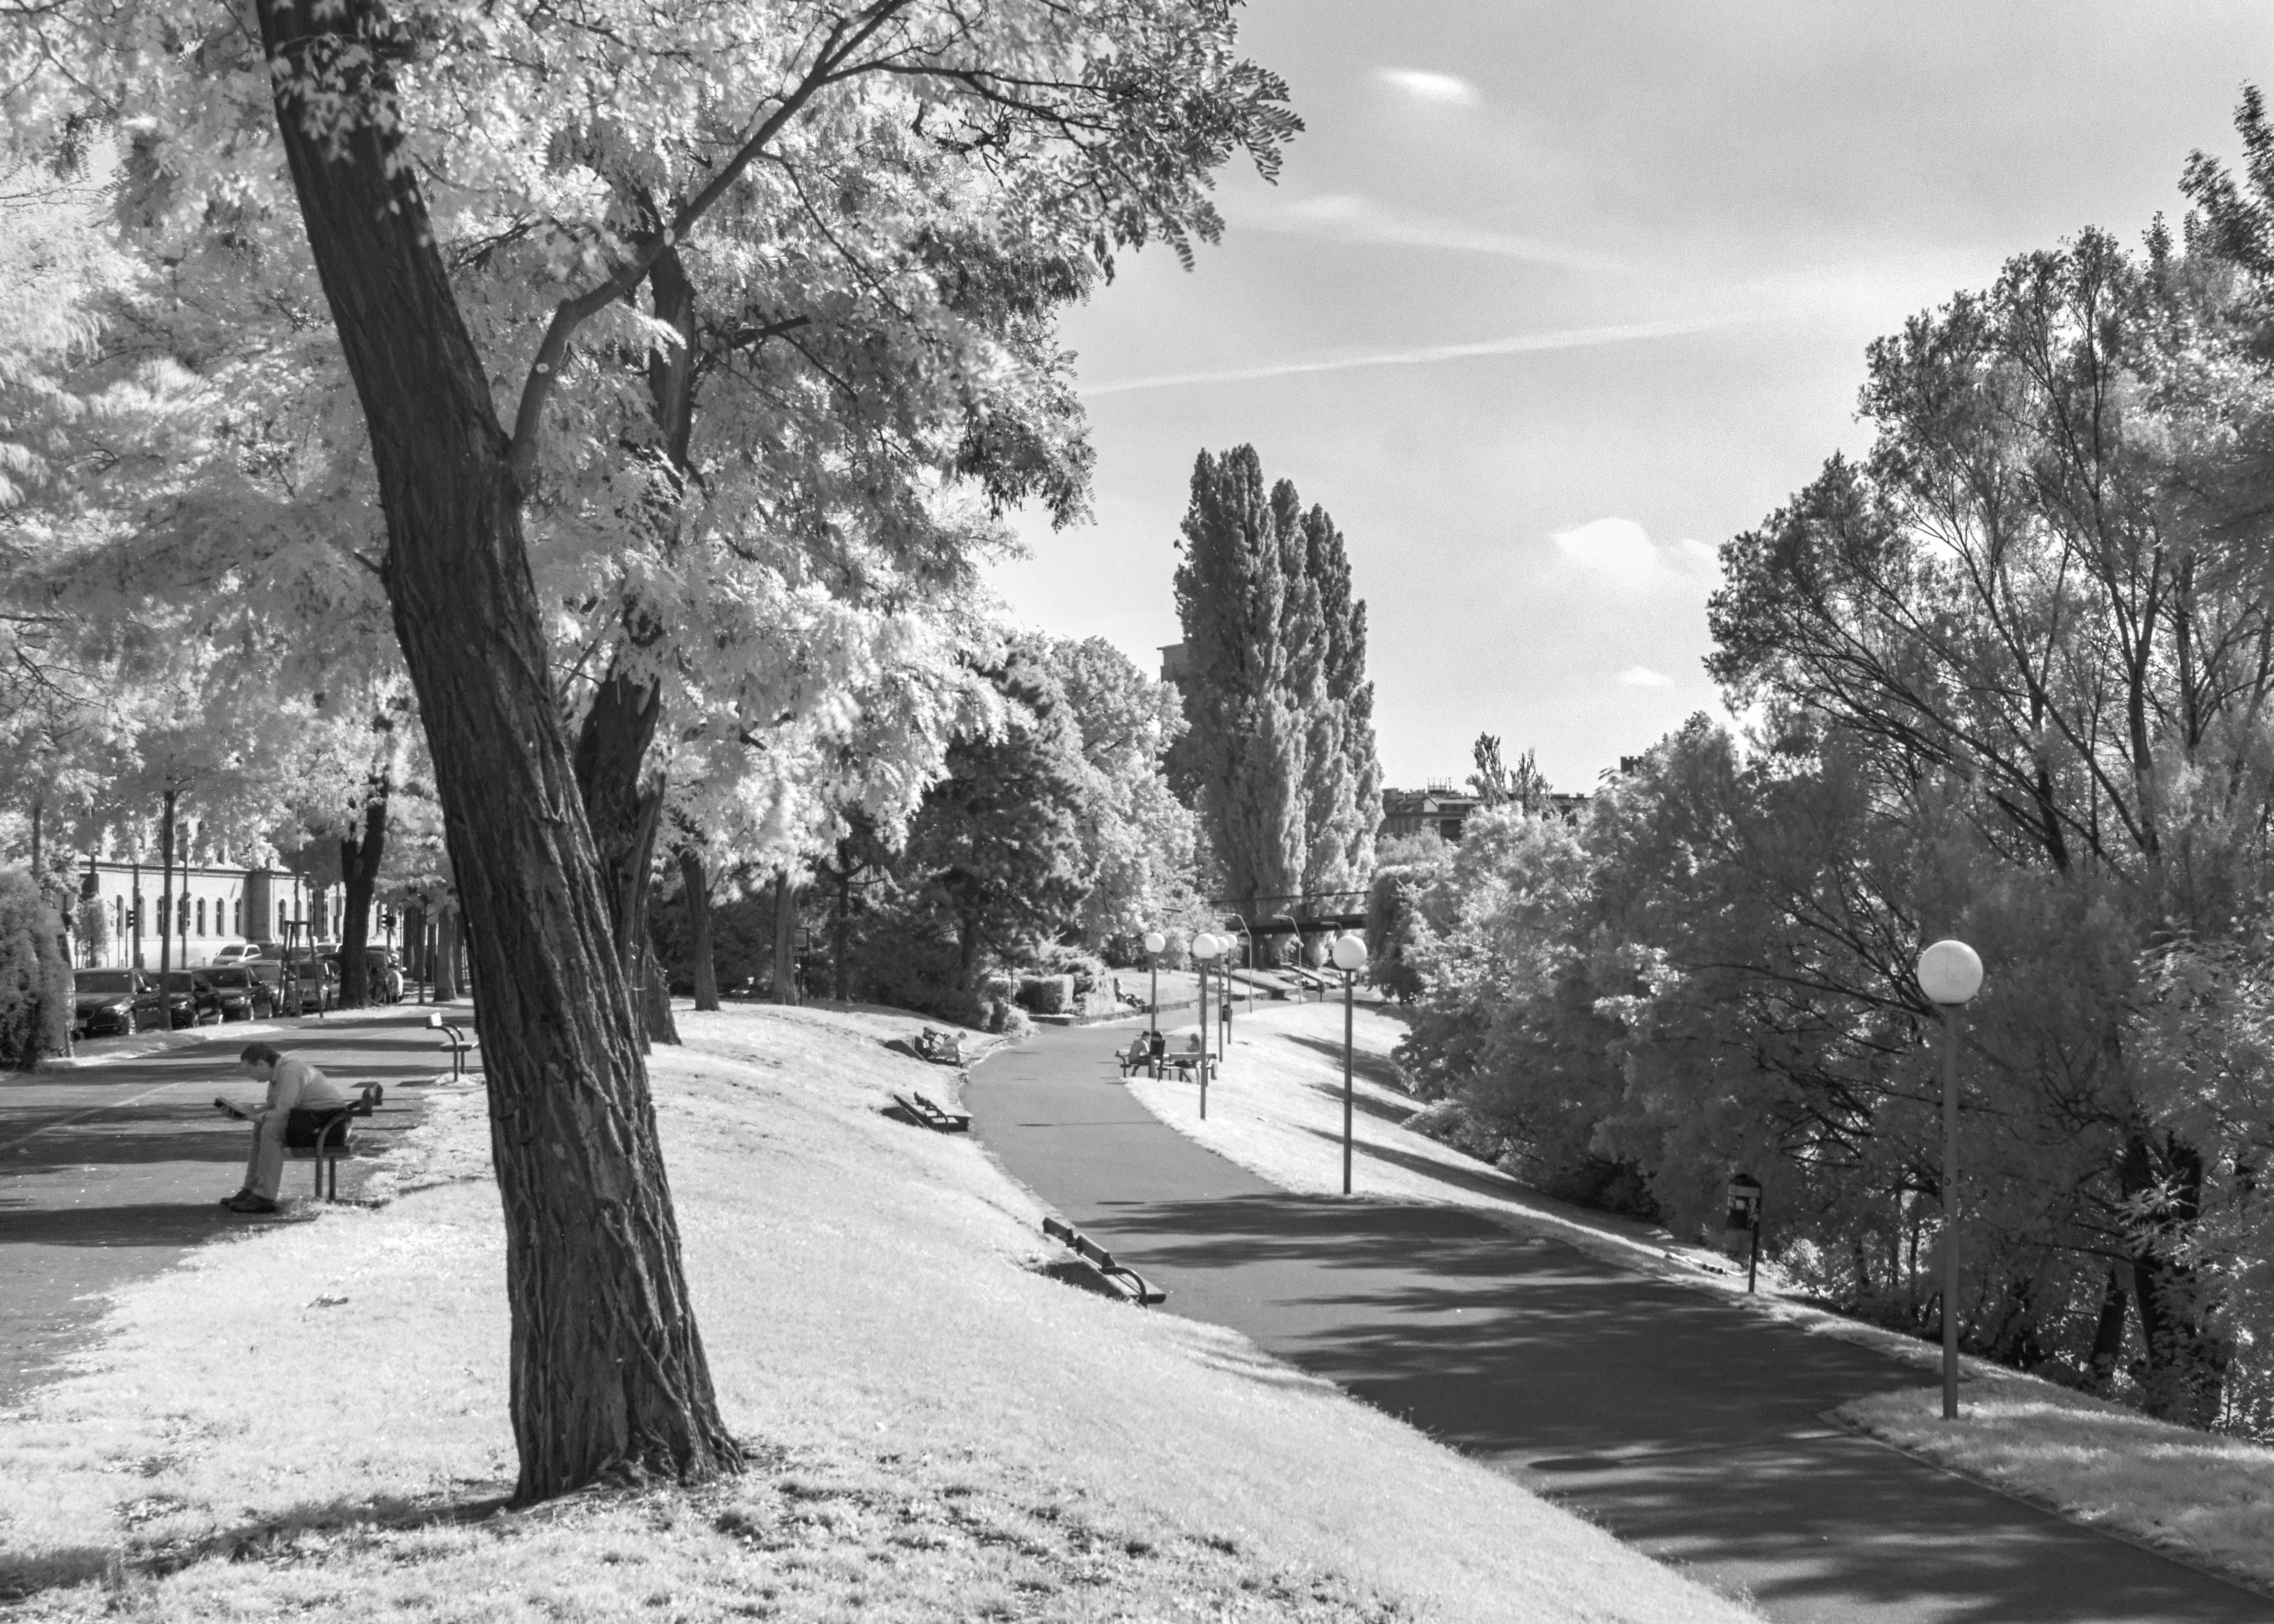 Ultragreen Vienna #infrared #danubecanal #donaukanal #vienna #canal #readingman